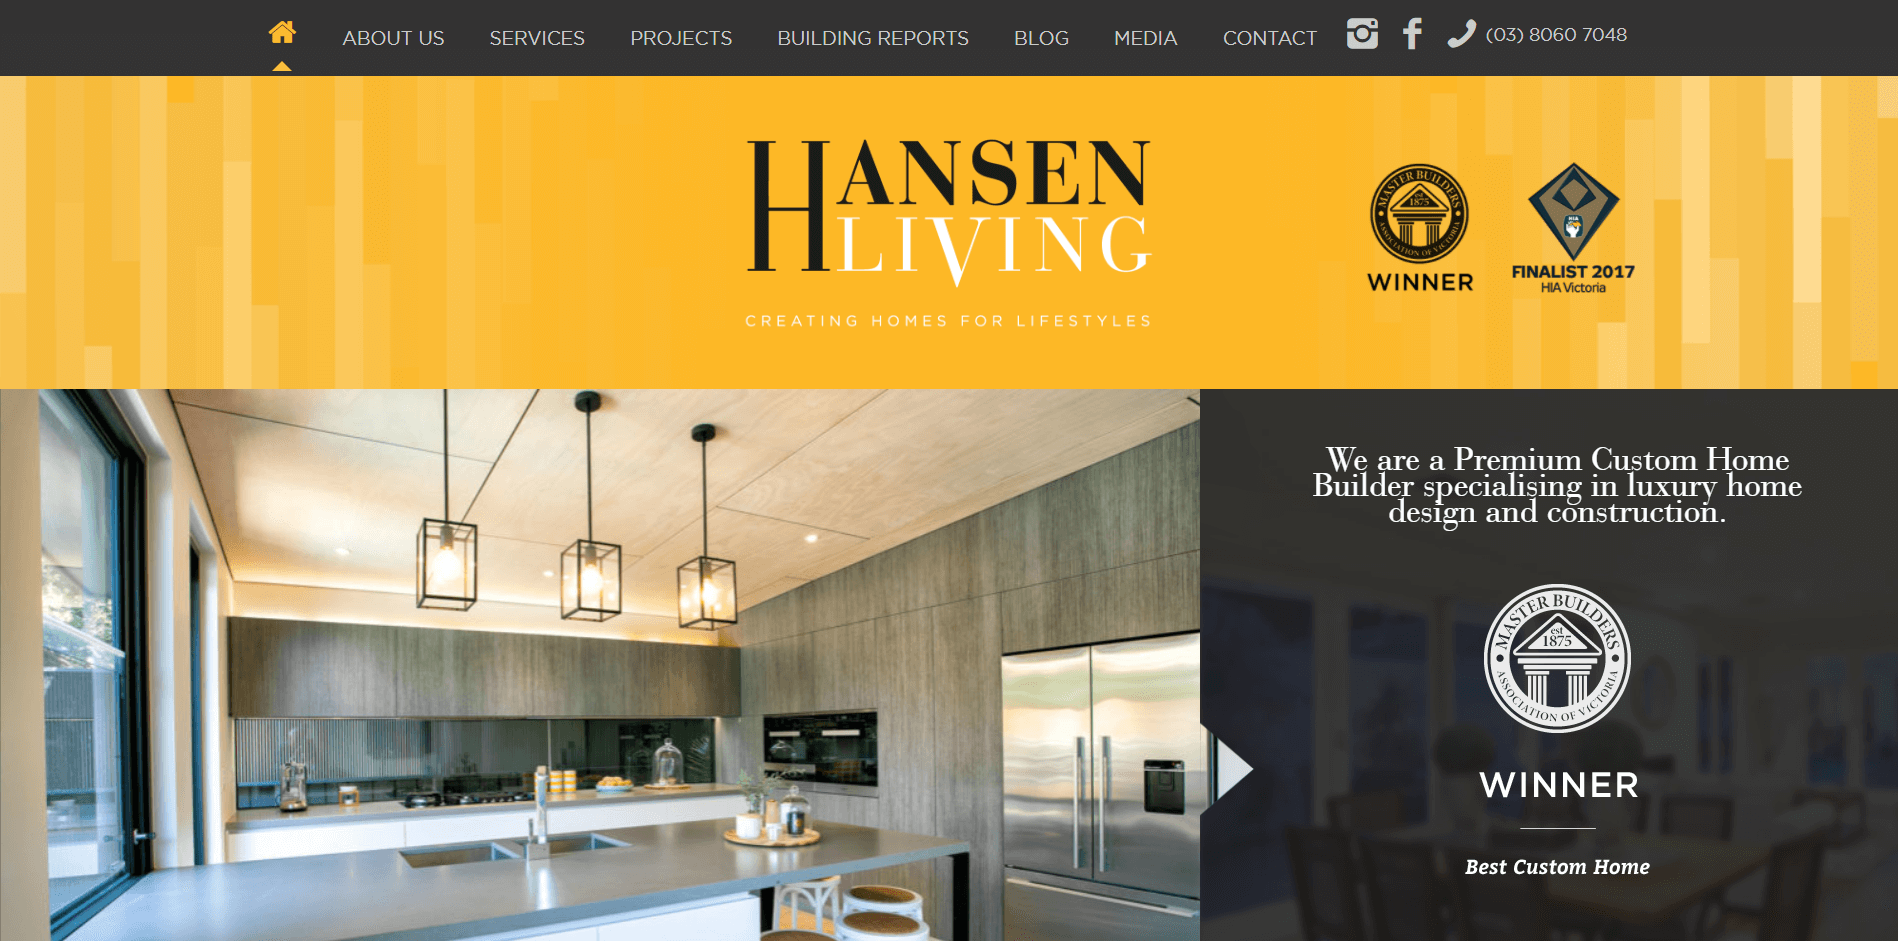 Hansen Living